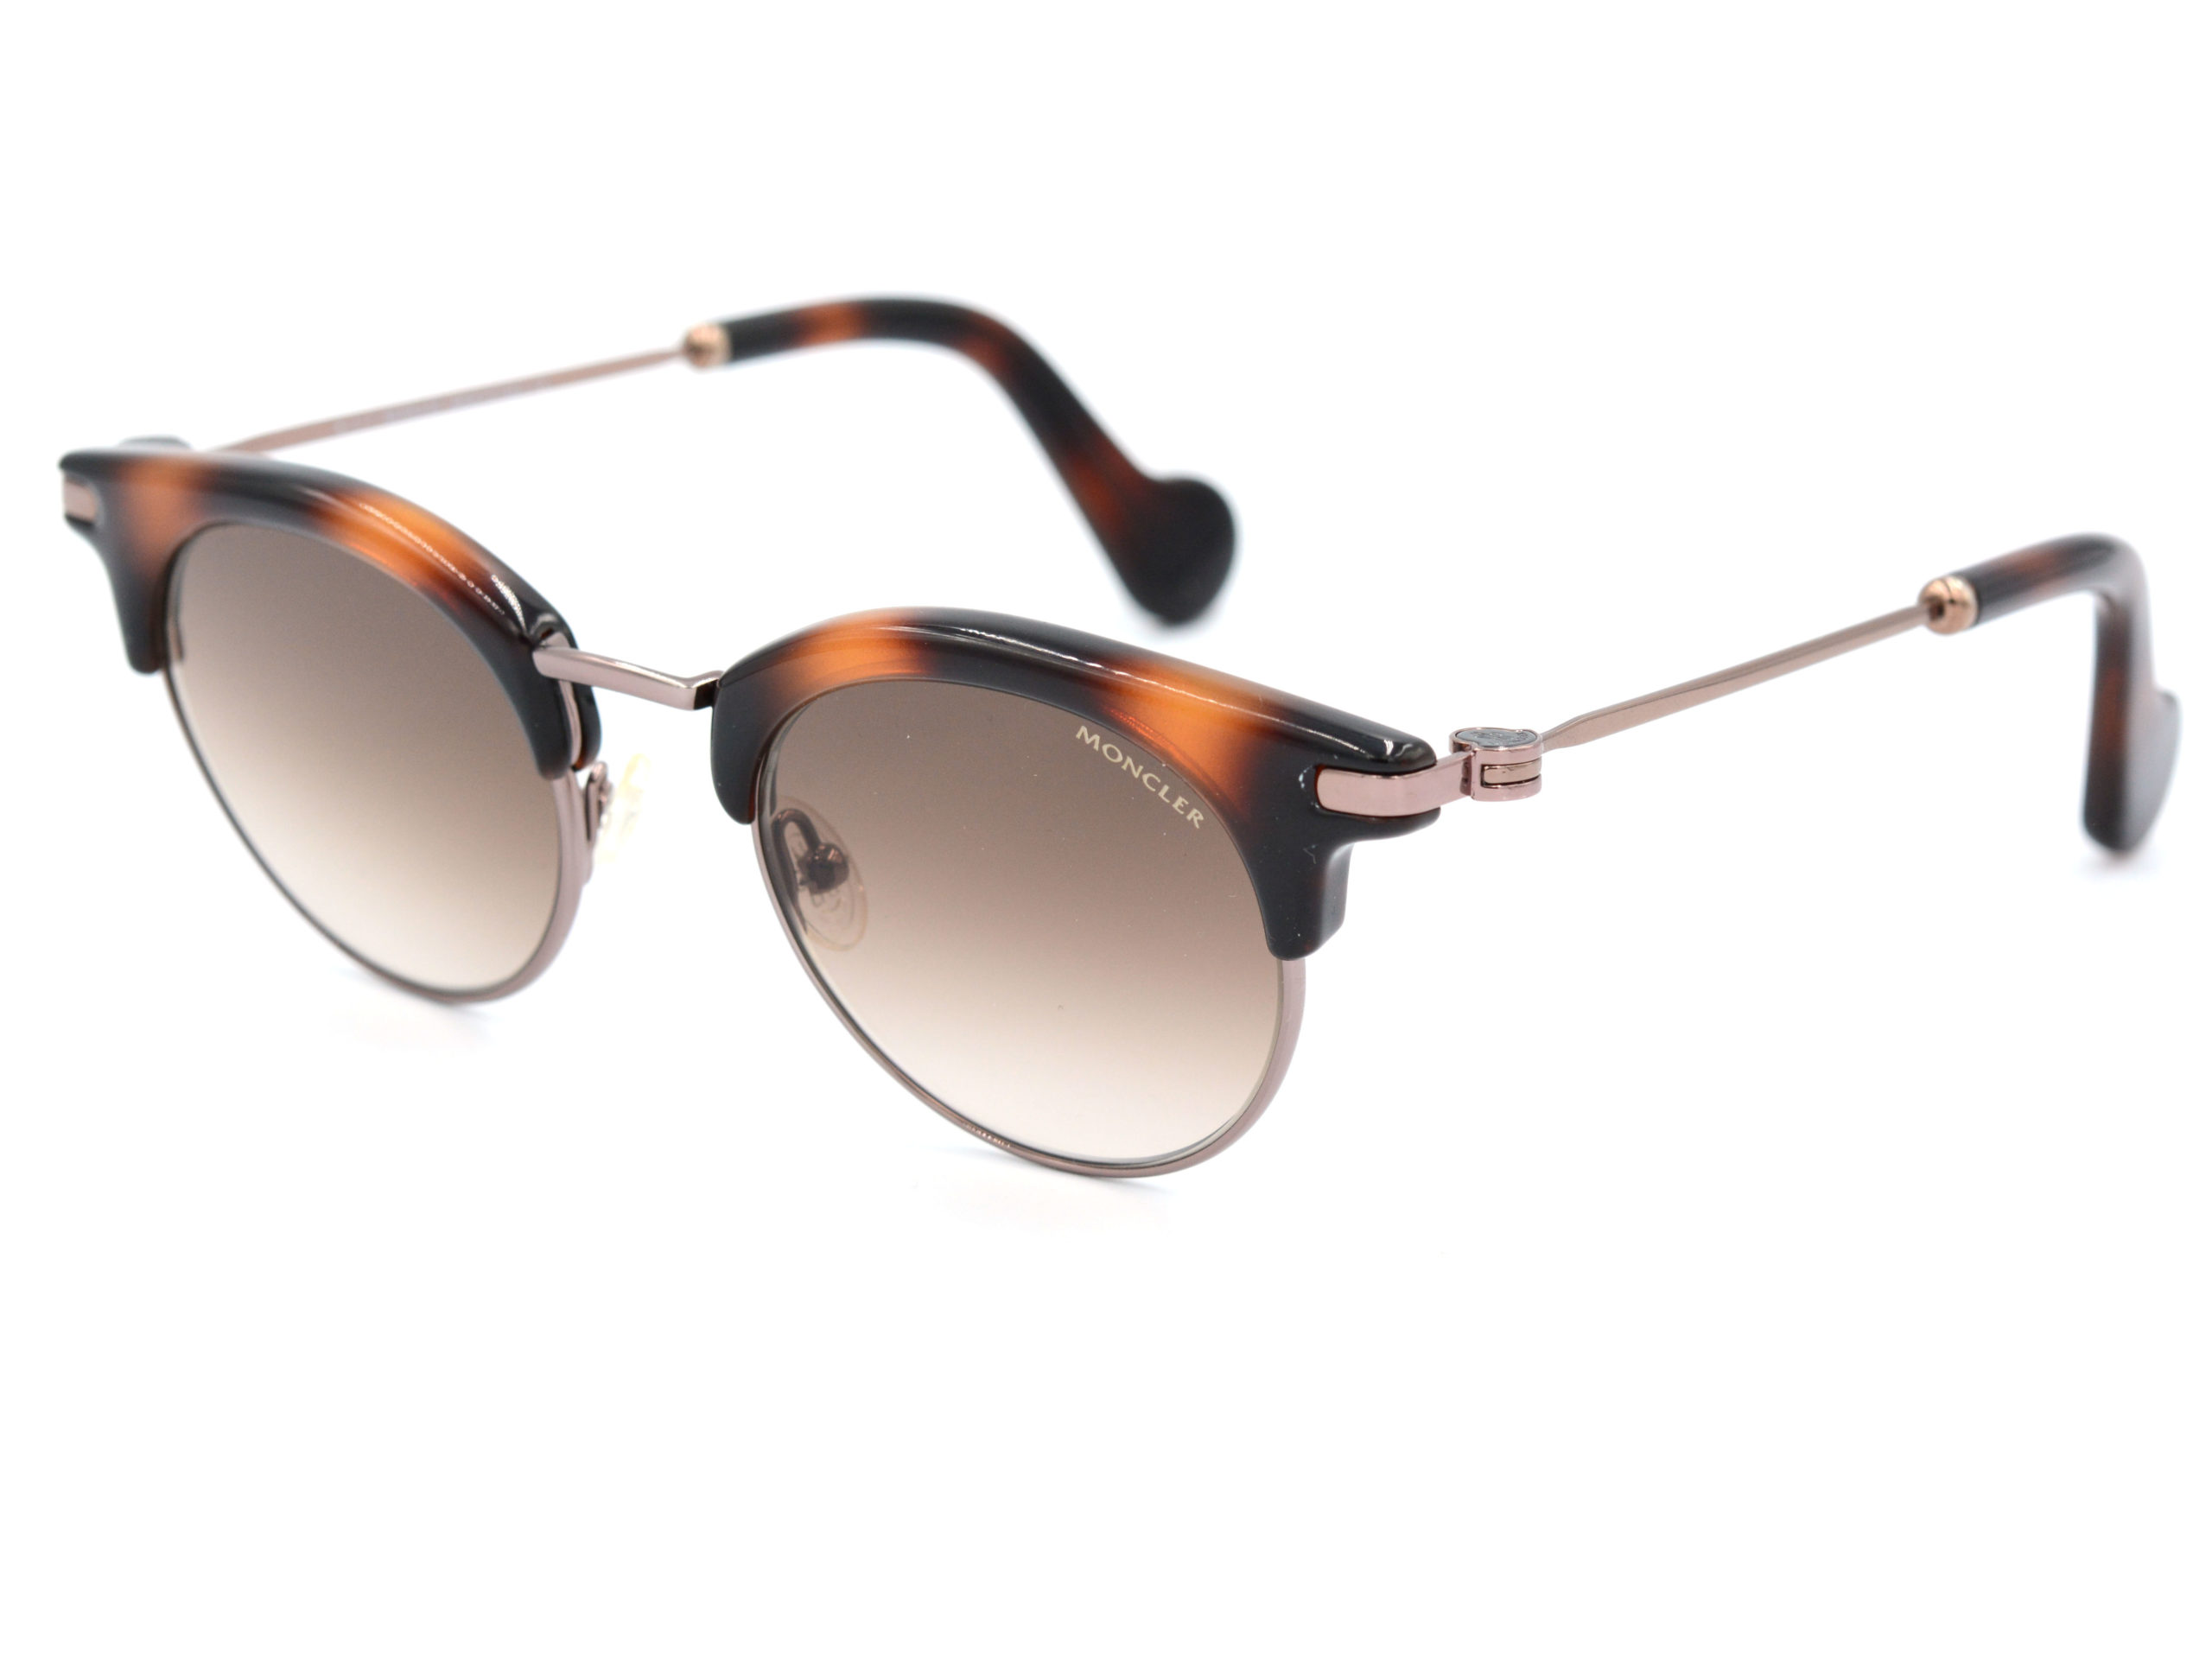 Sunglasses MONCLER ML0035 52F 47-20-145 Unisex 2020